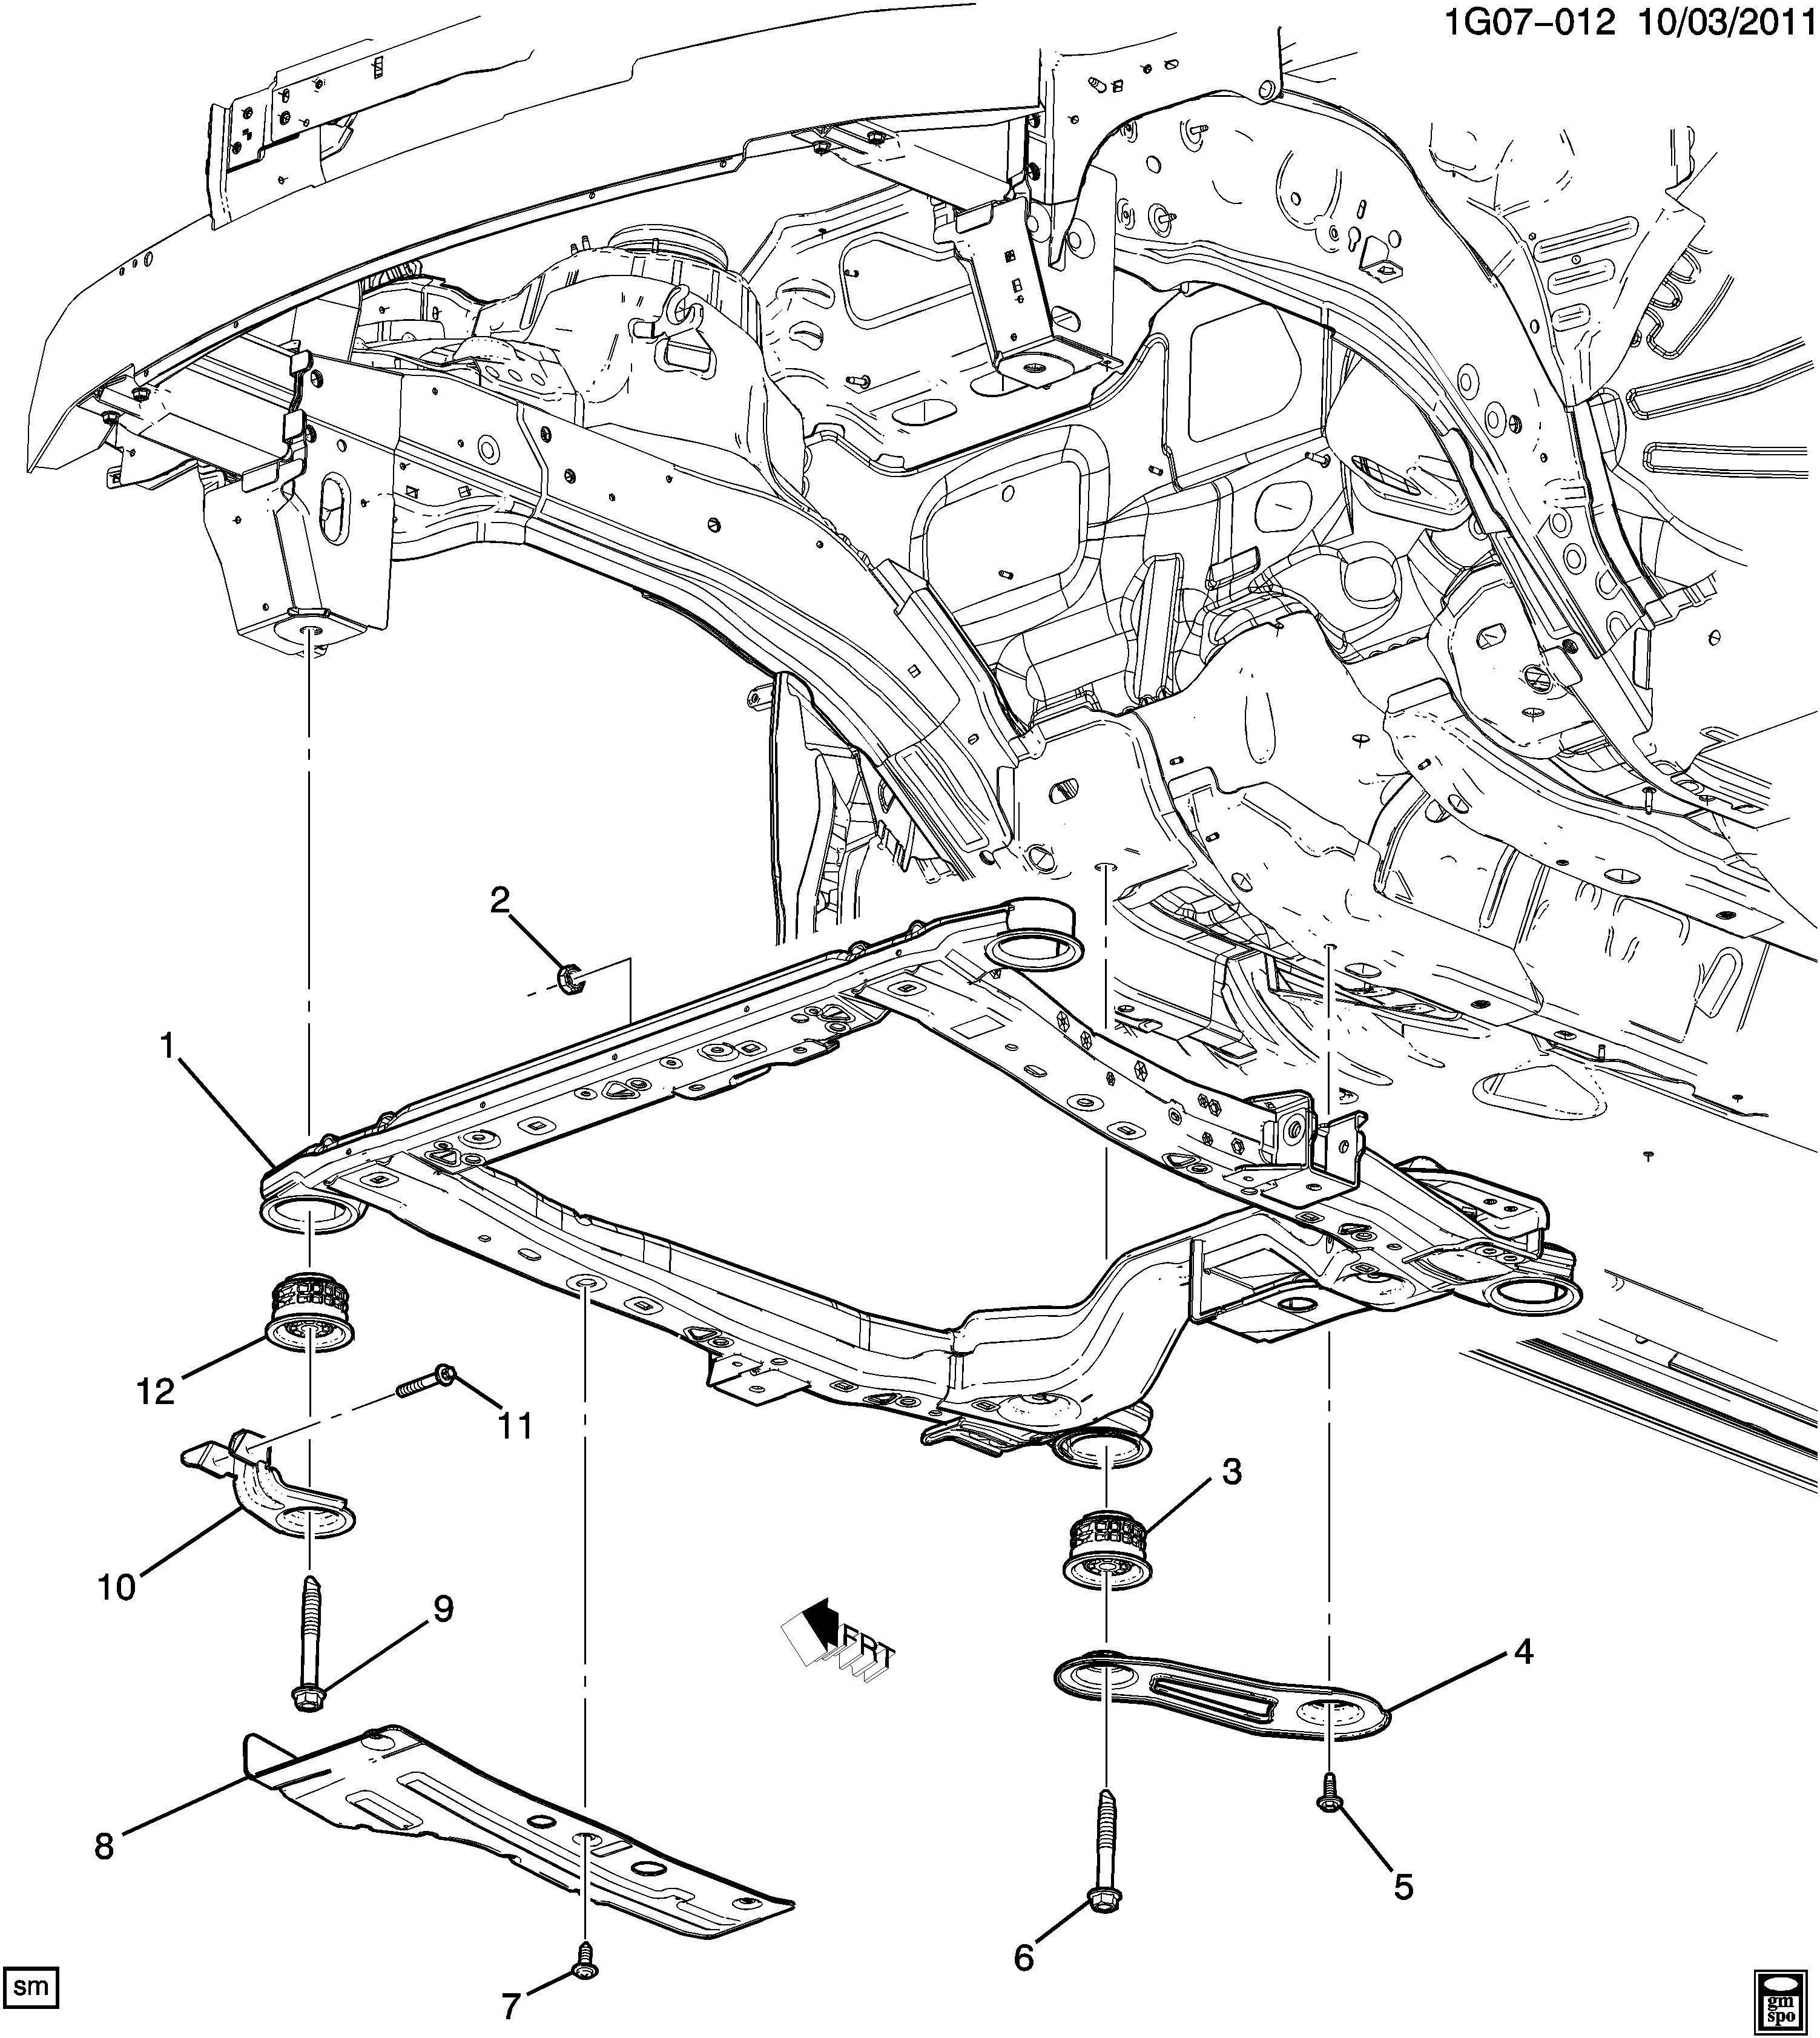 Chevrolet Malibu Frame. Chassis. Frame, drivetrain & frt